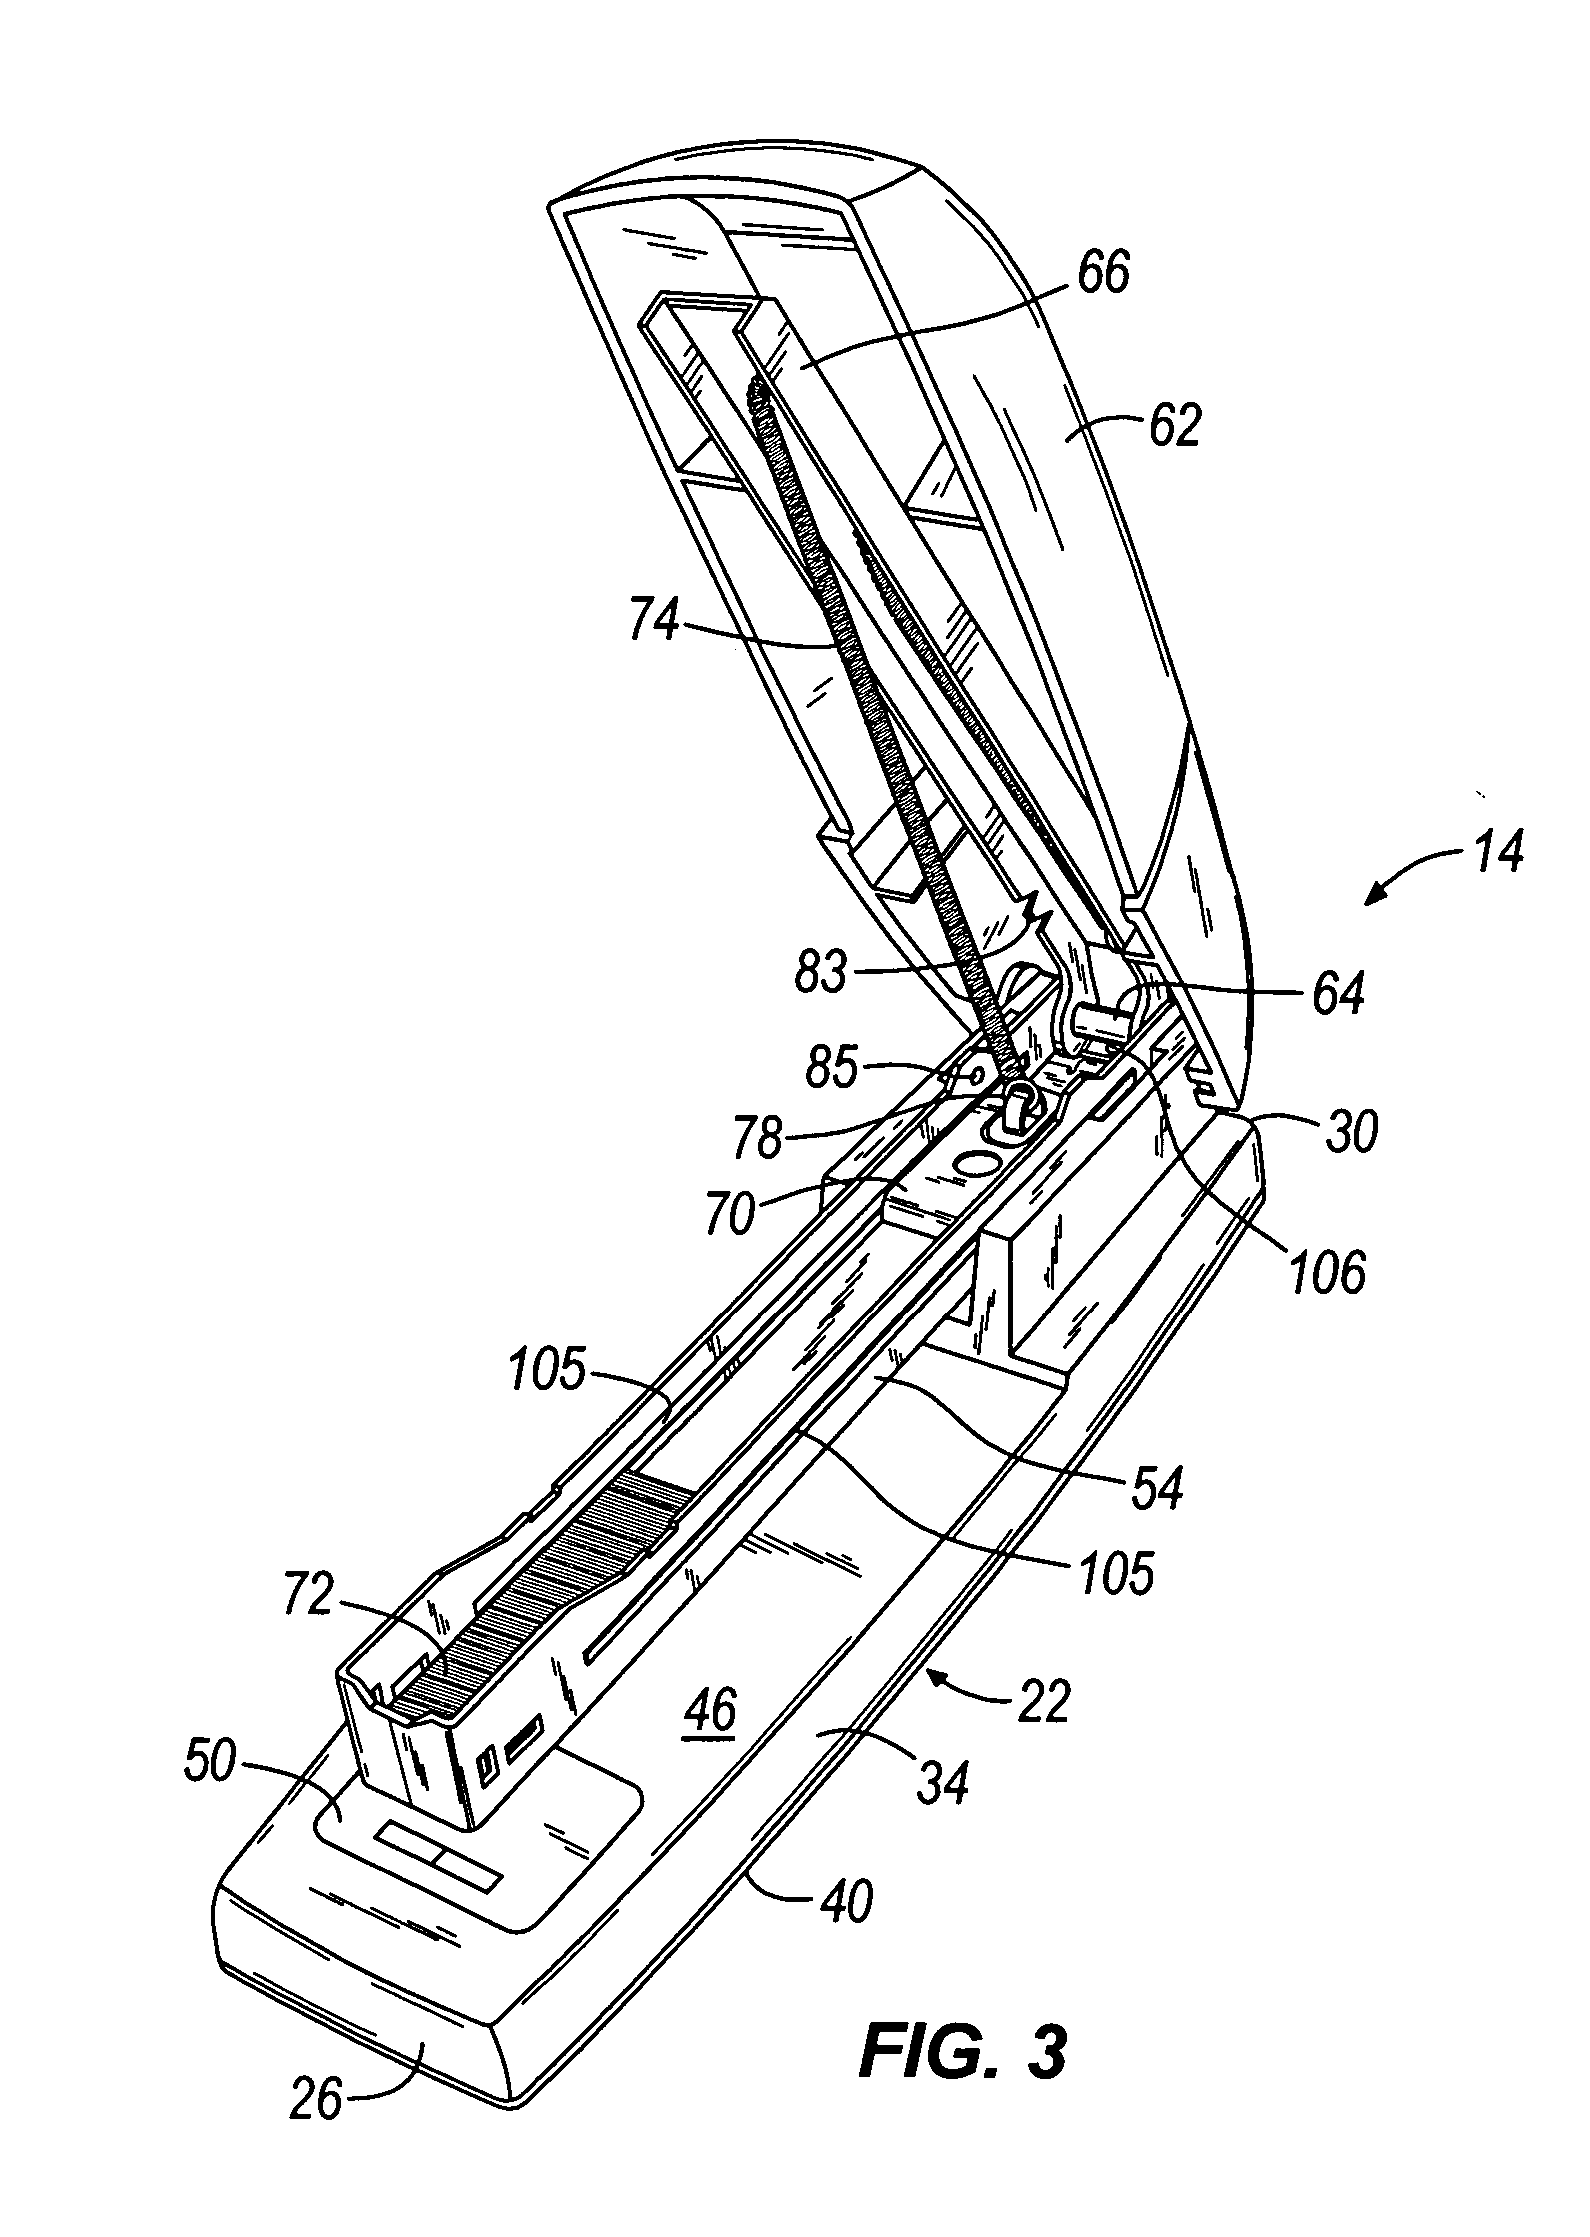 Swingline Stapler Parts Diagram